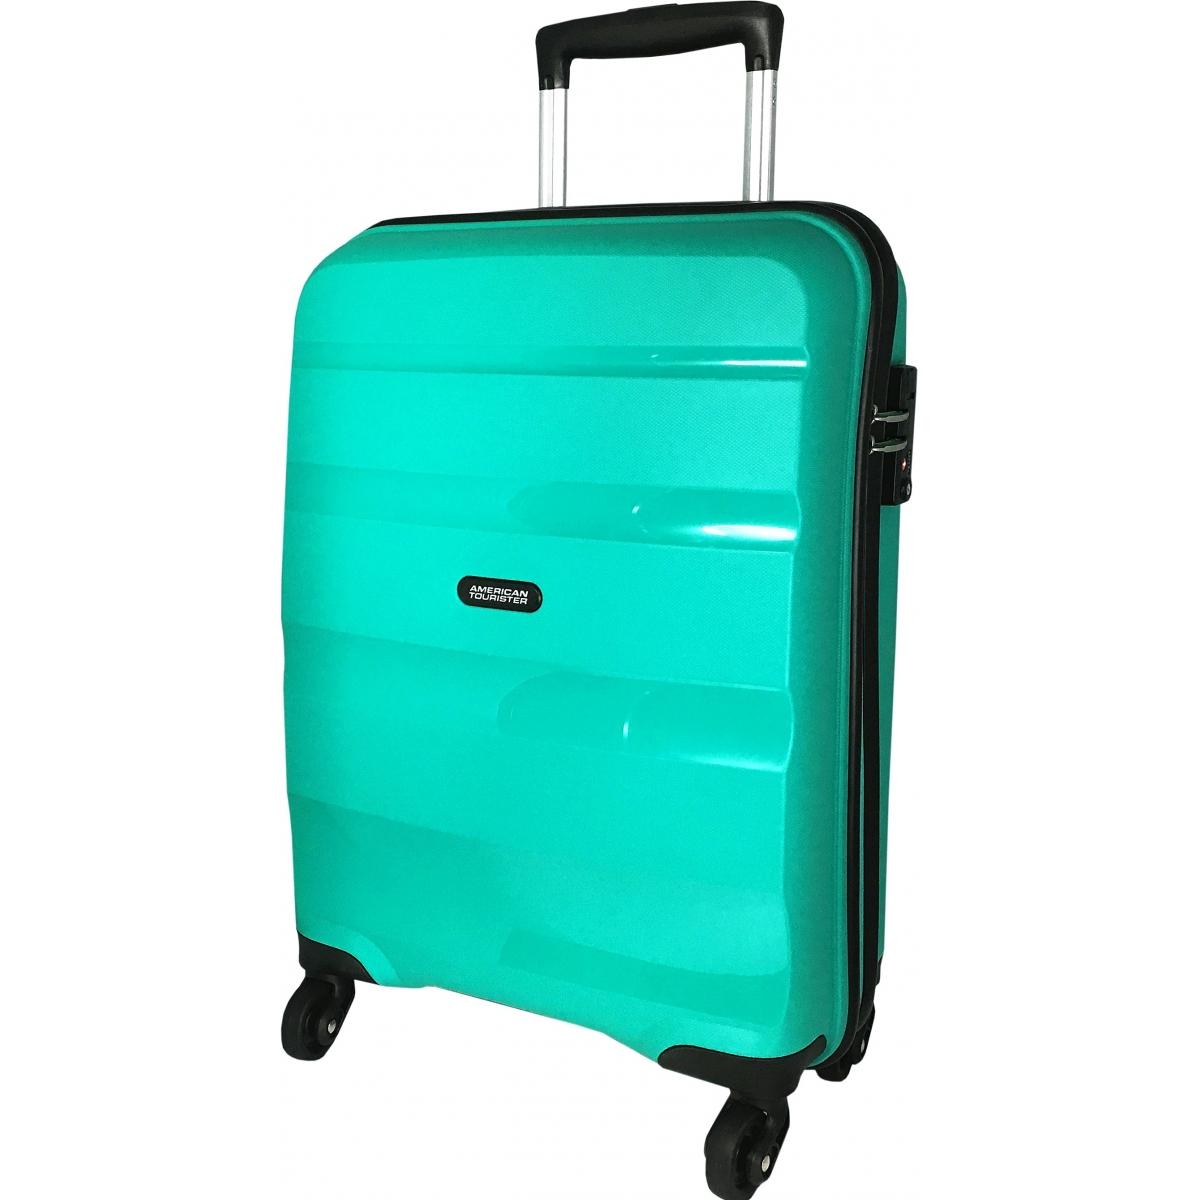 valise cabine bon air american tourister 55cm bonair22 couleur principale vert valise. Black Bedroom Furniture Sets. Home Design Ideas